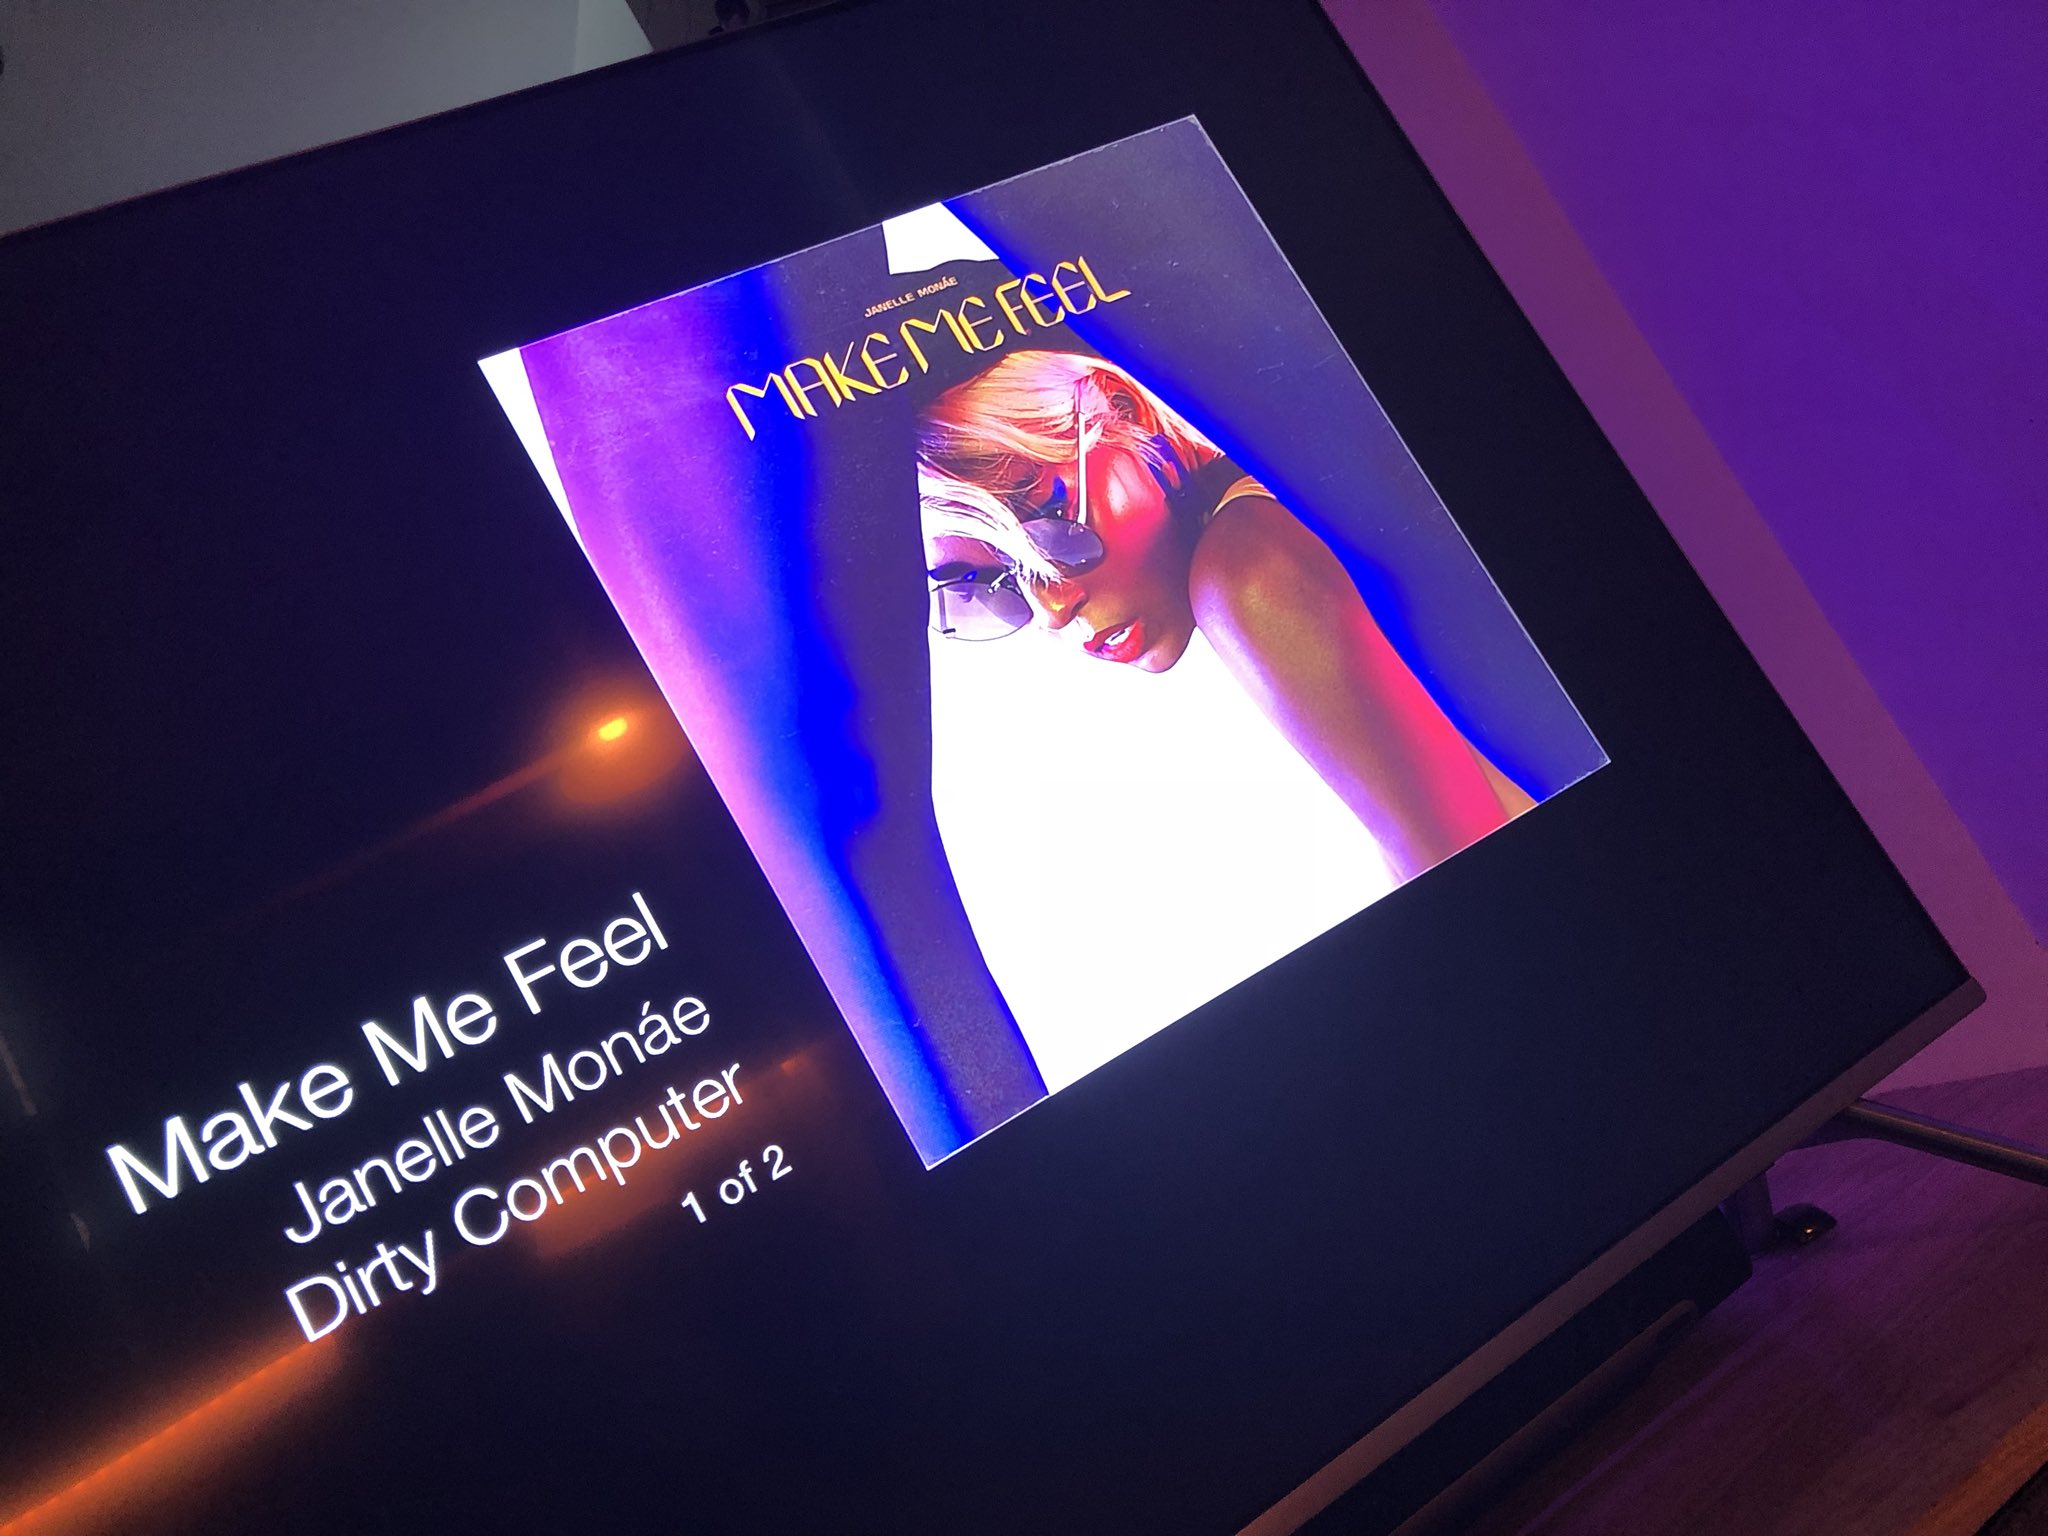 RT @ElliotCrutchley: JANELLE IS FUCKING HERE!!!!! @JanelleMonae @zanelowe WOW!!! https://t.co/cbobjzqRwh